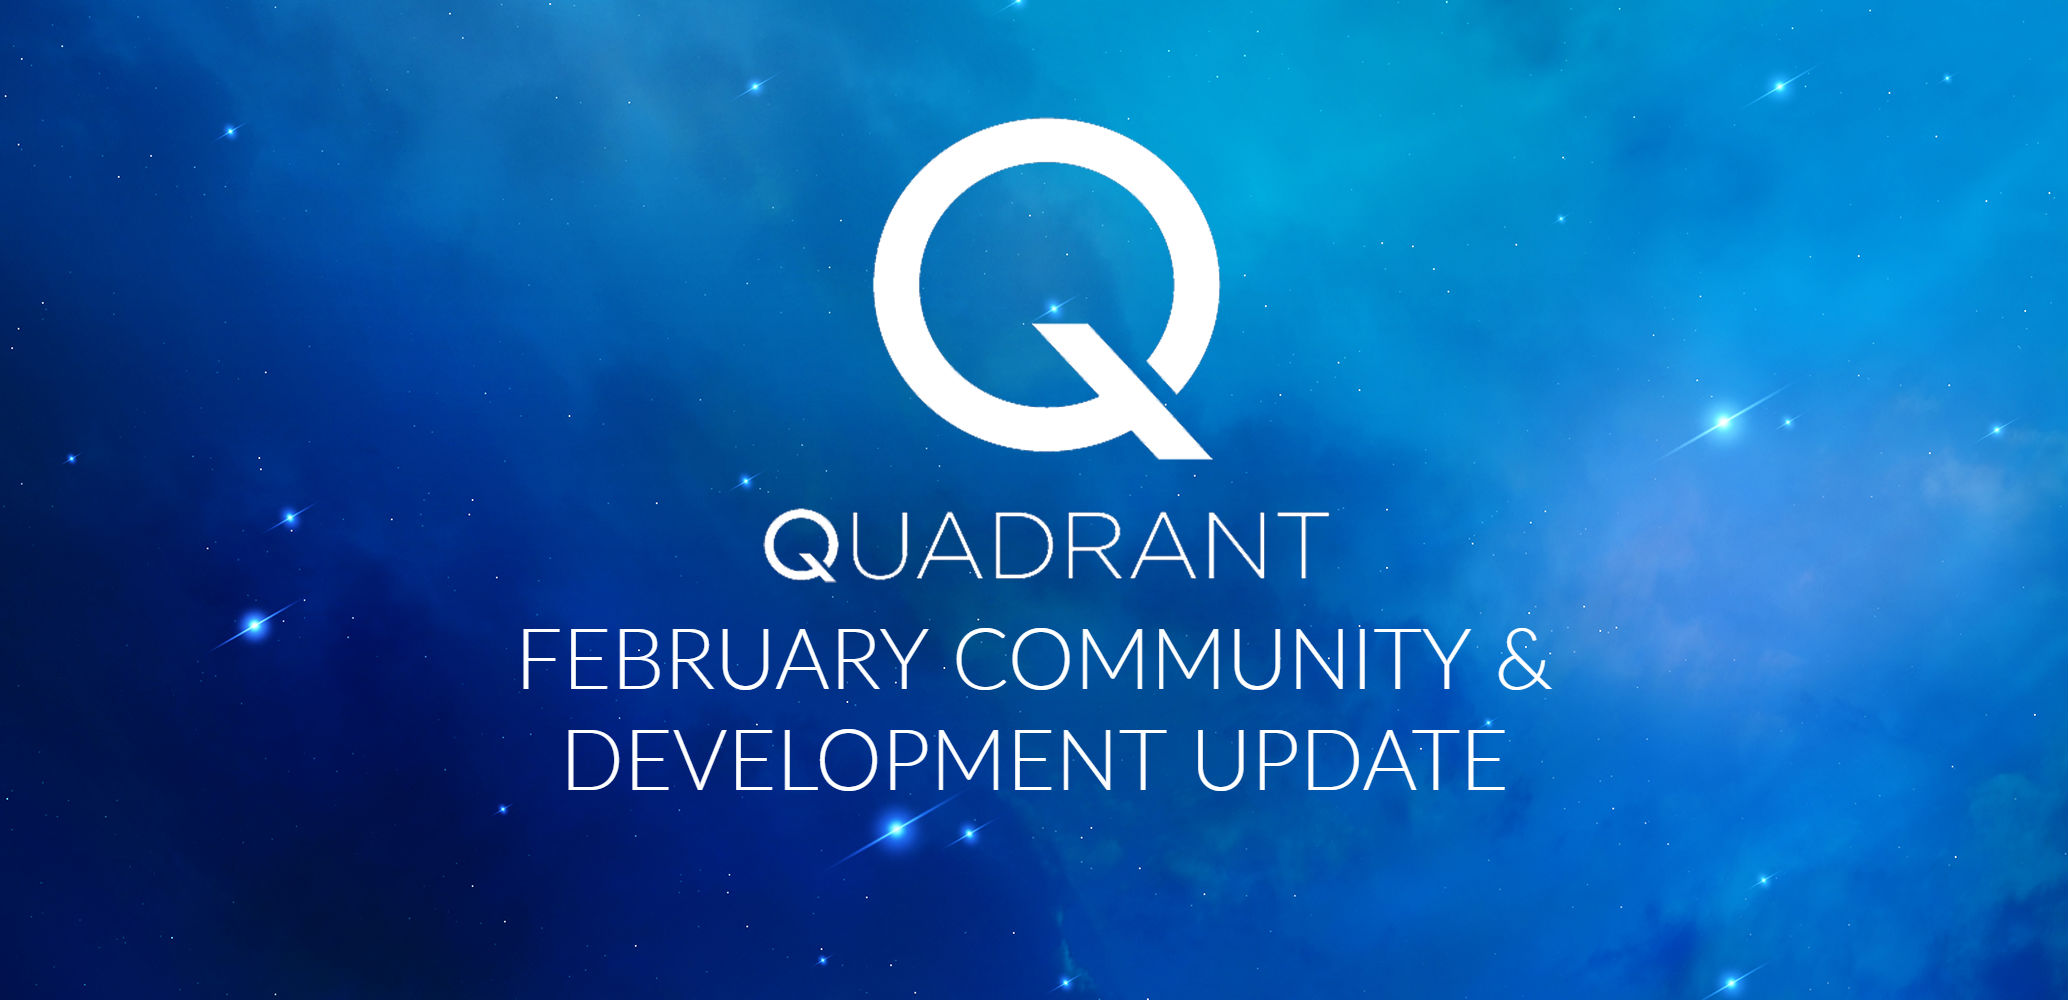 MediumArticle - Feb Update